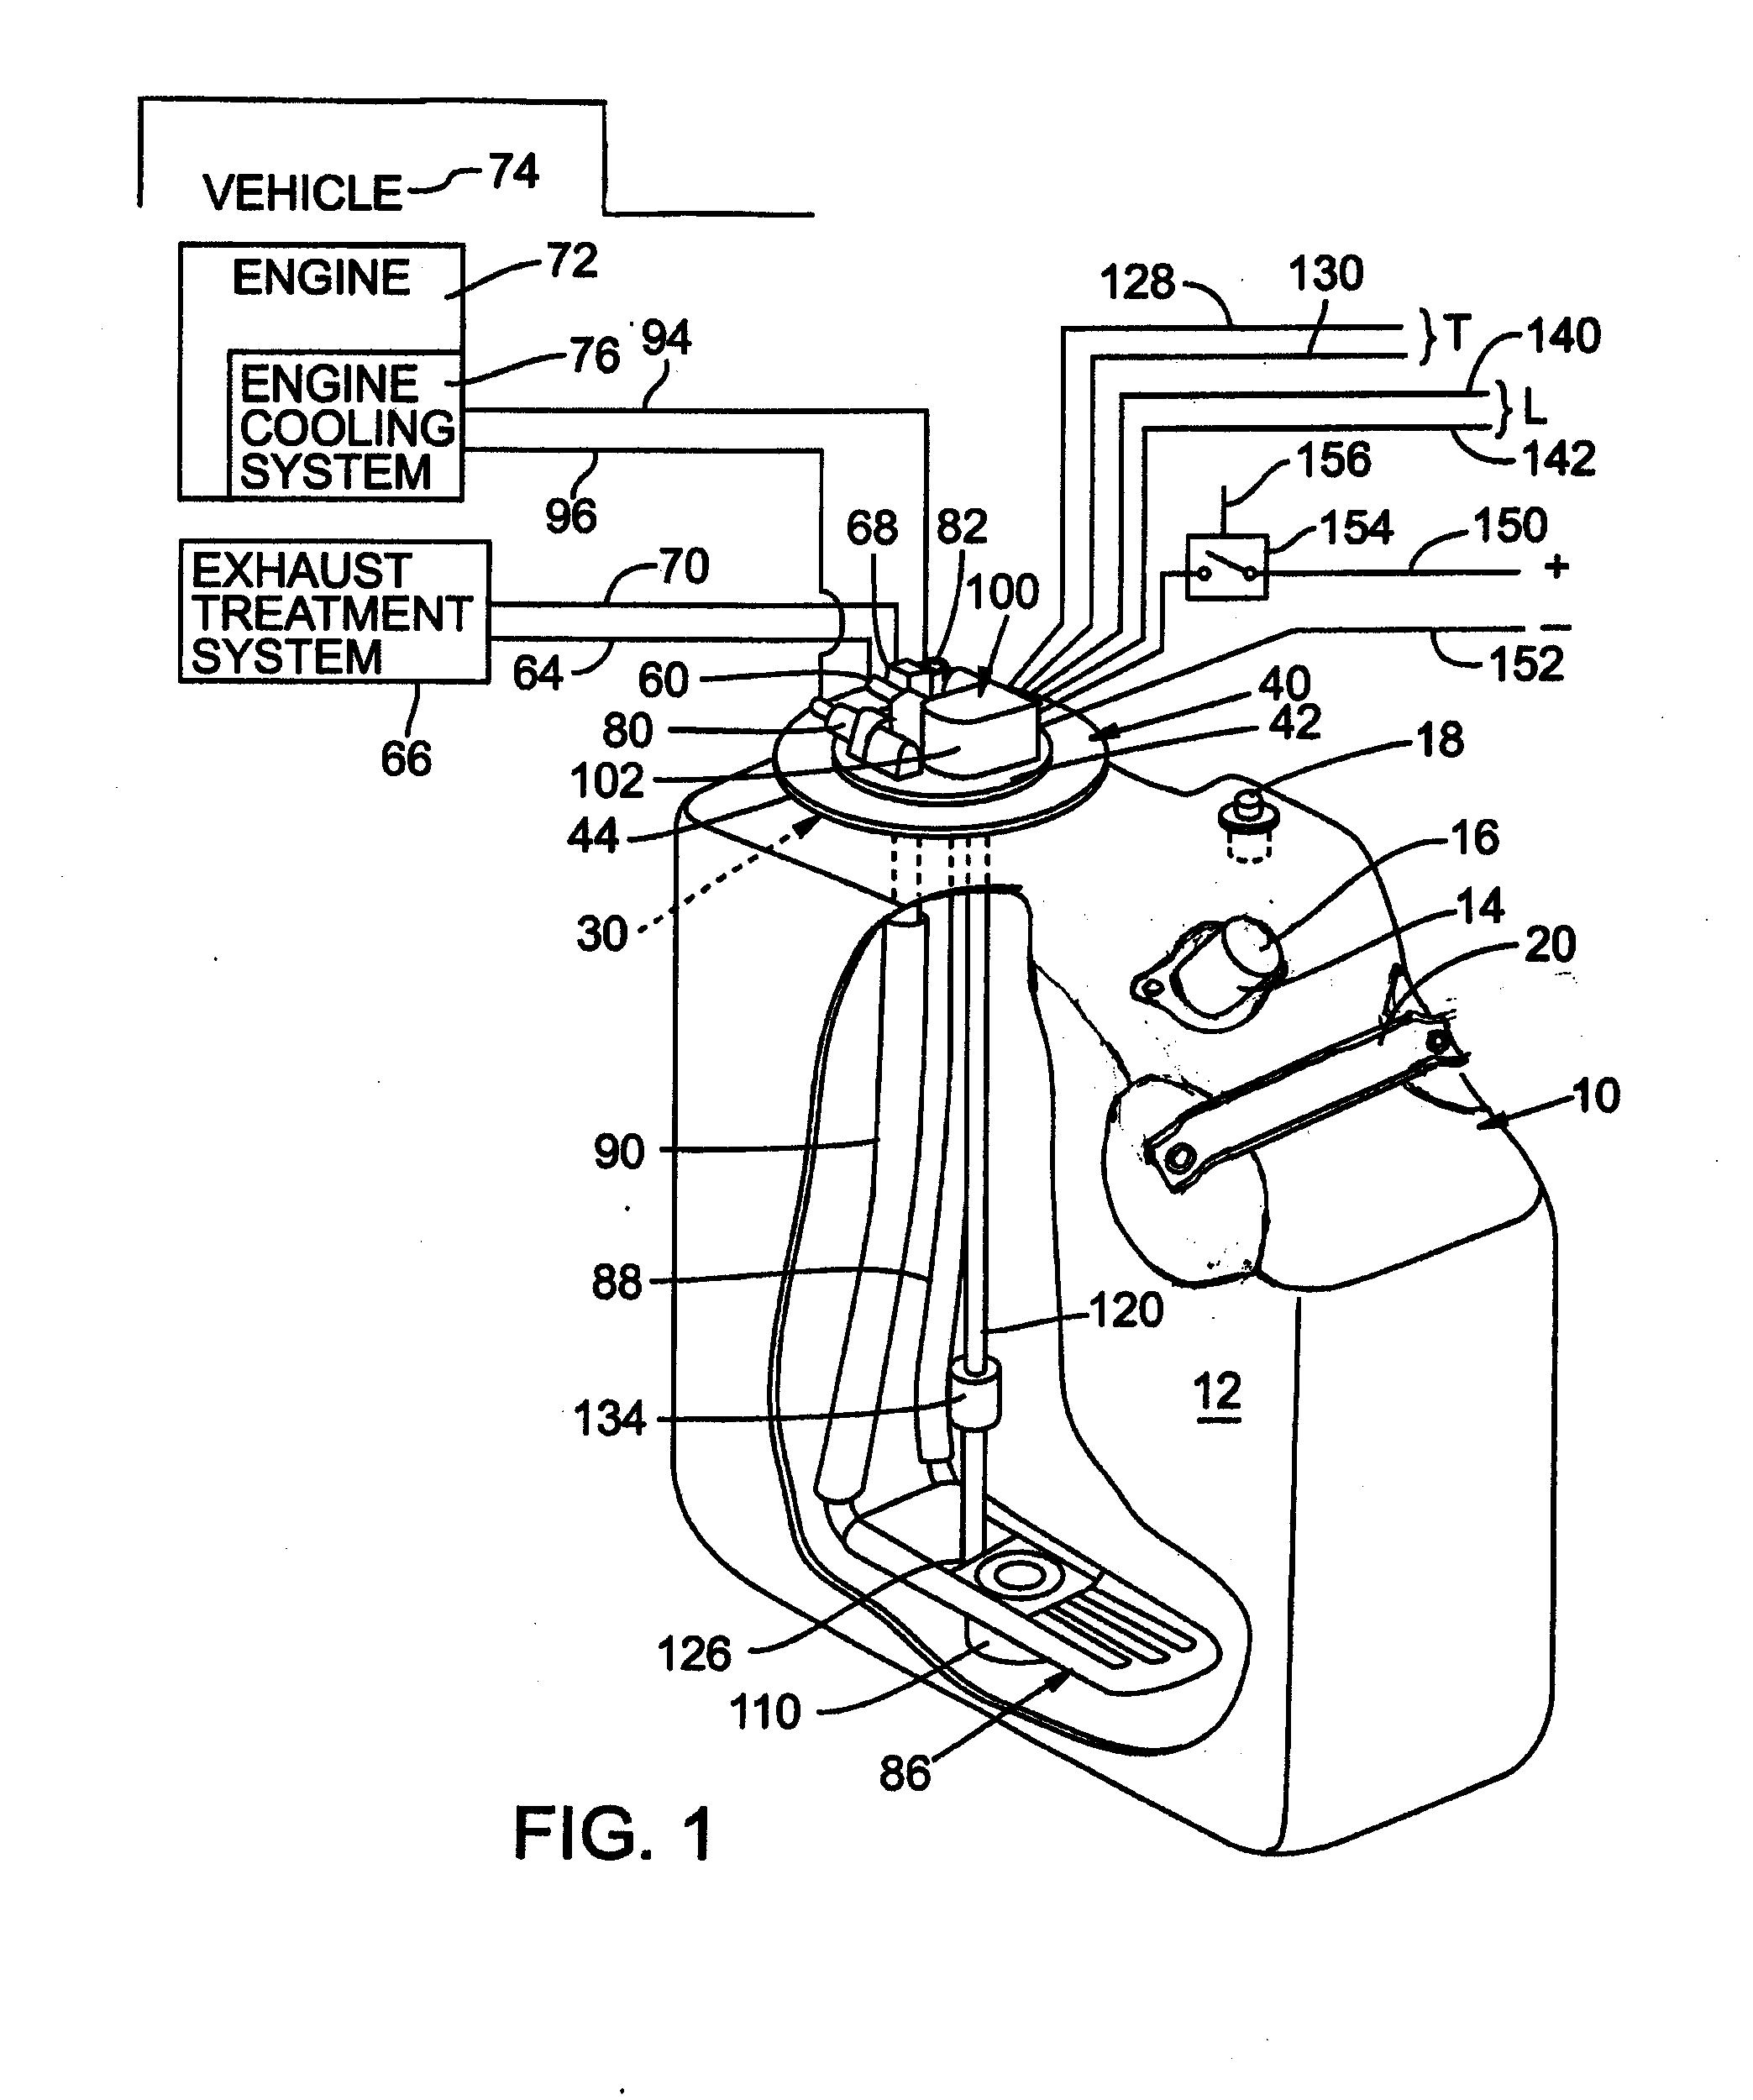 hyvair valve wiring diagram